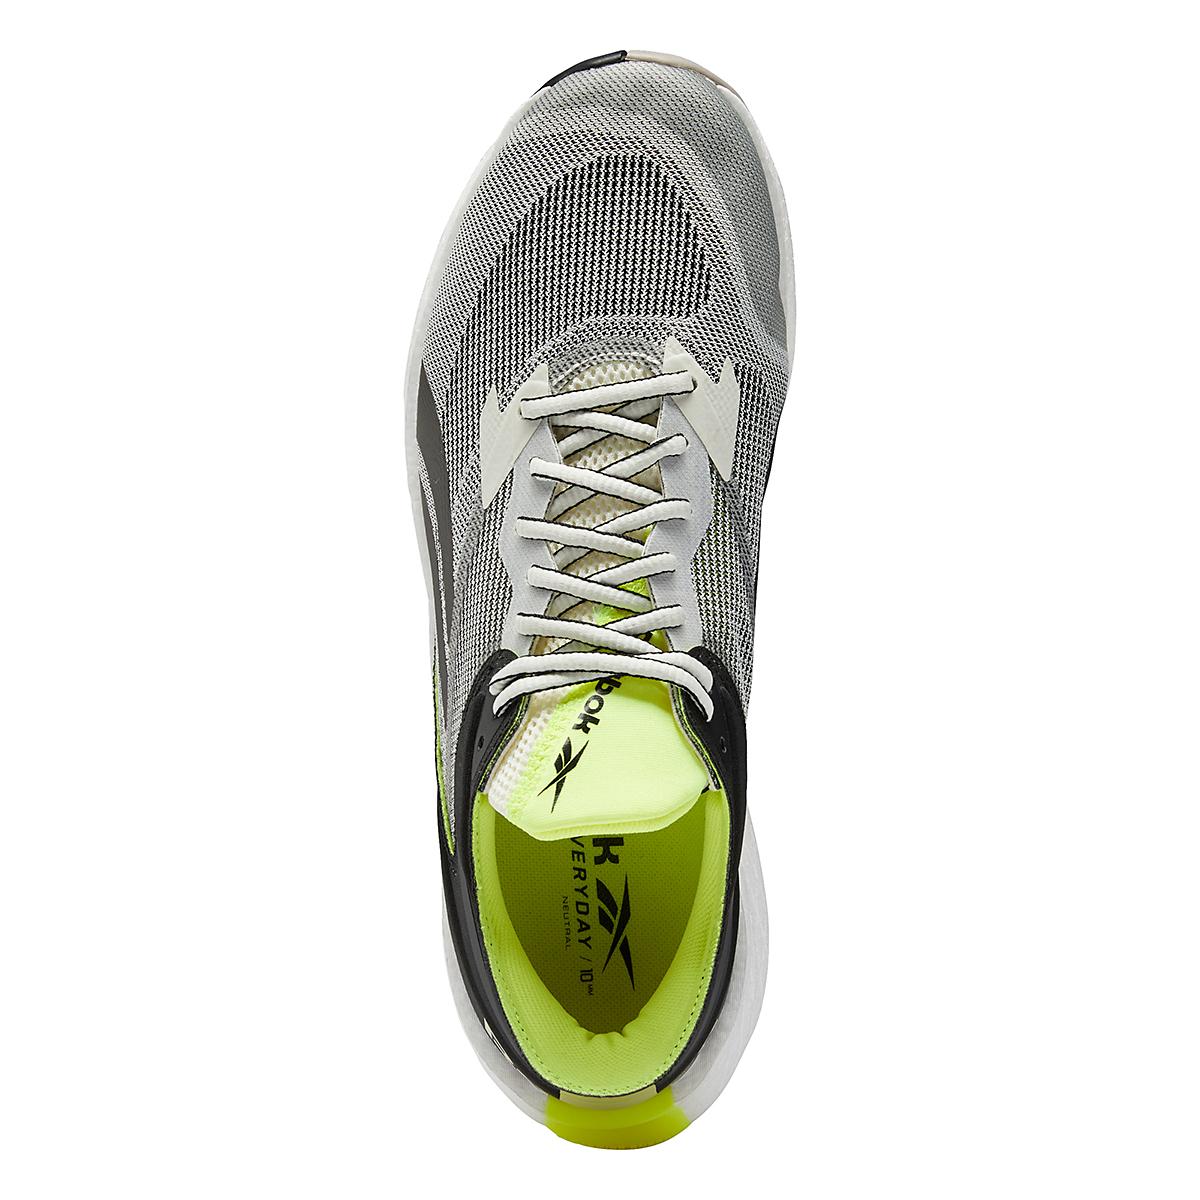 Men's Reebok Floatride Energy Symmetros Running Shoe - Color: Classic White/Core Black/Yellow Flare - Size: 7 - Width: Regular, Classic White/Core Black/Yellow Flare, large, image 7